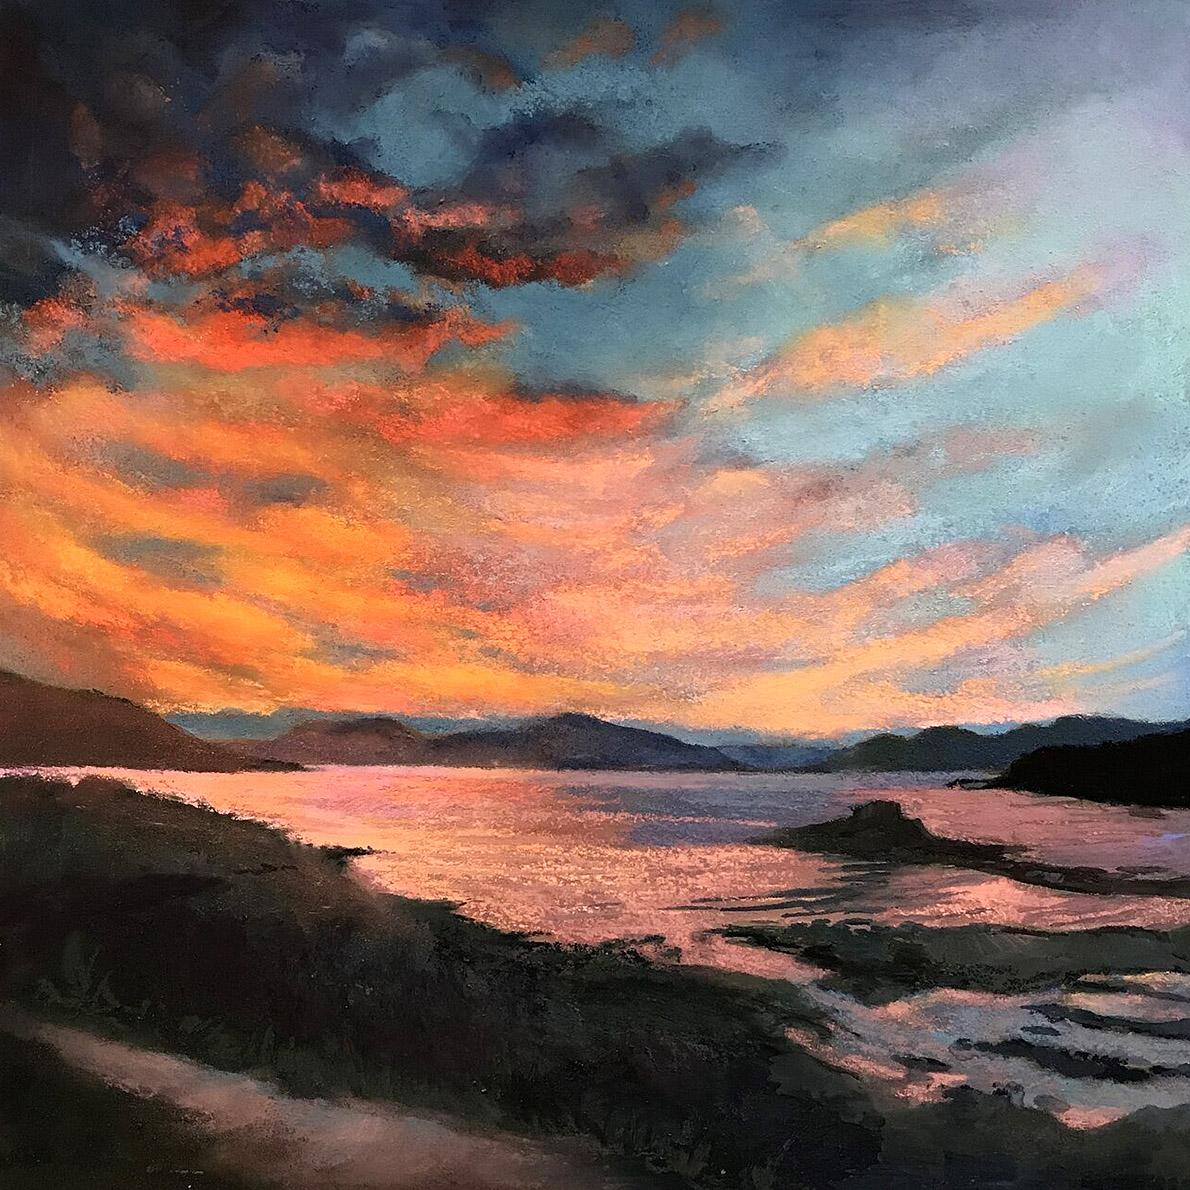 Margaret Evans, 'Night Skye in Motion', pastel and gouache